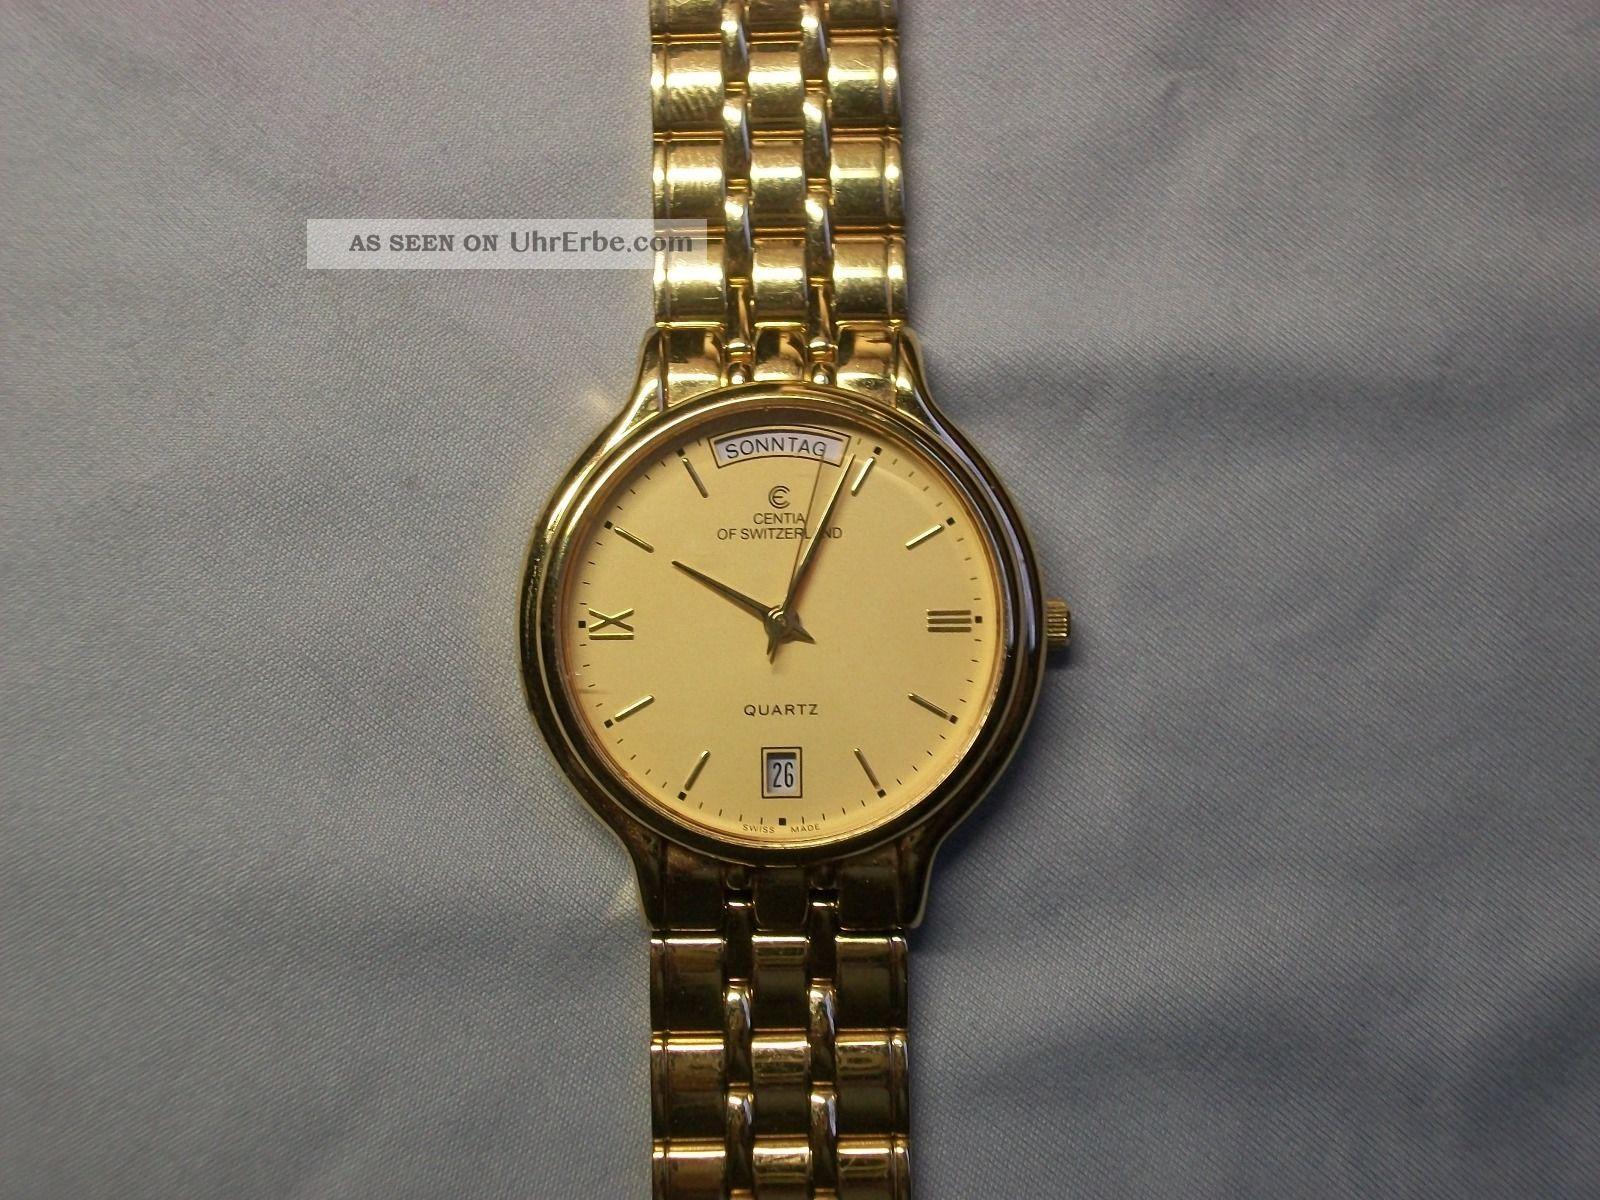 Centia Swiss Bg - 904 Armbanduhr Für Herren Vergoldet Armbanduhren Bild